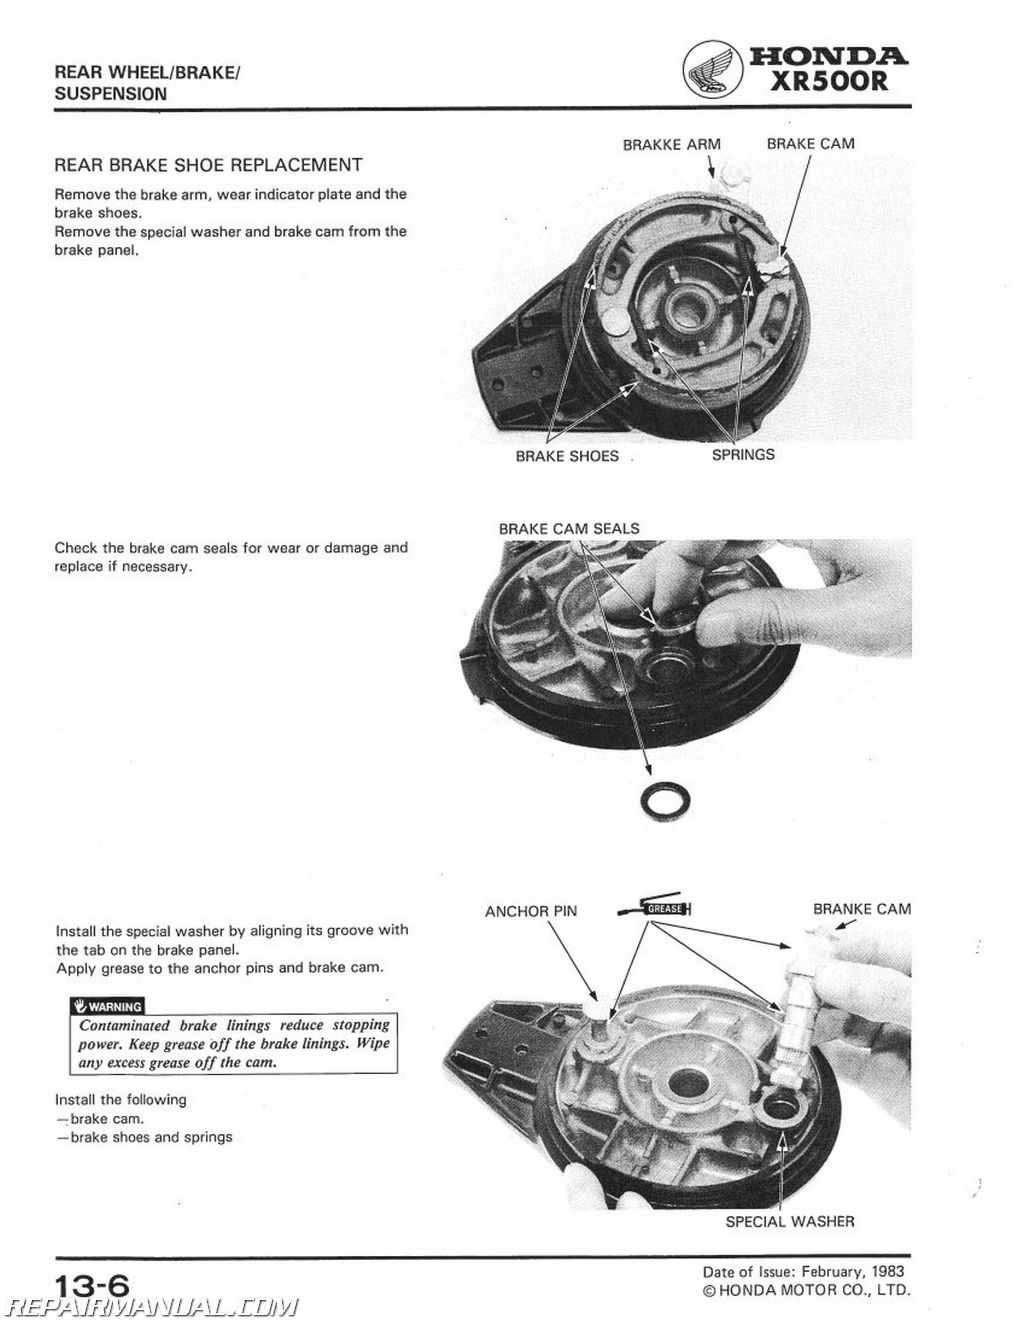 Honda XRR Motorcycle Service Manual - 1977 honda odyssey fl250 wiring diagram